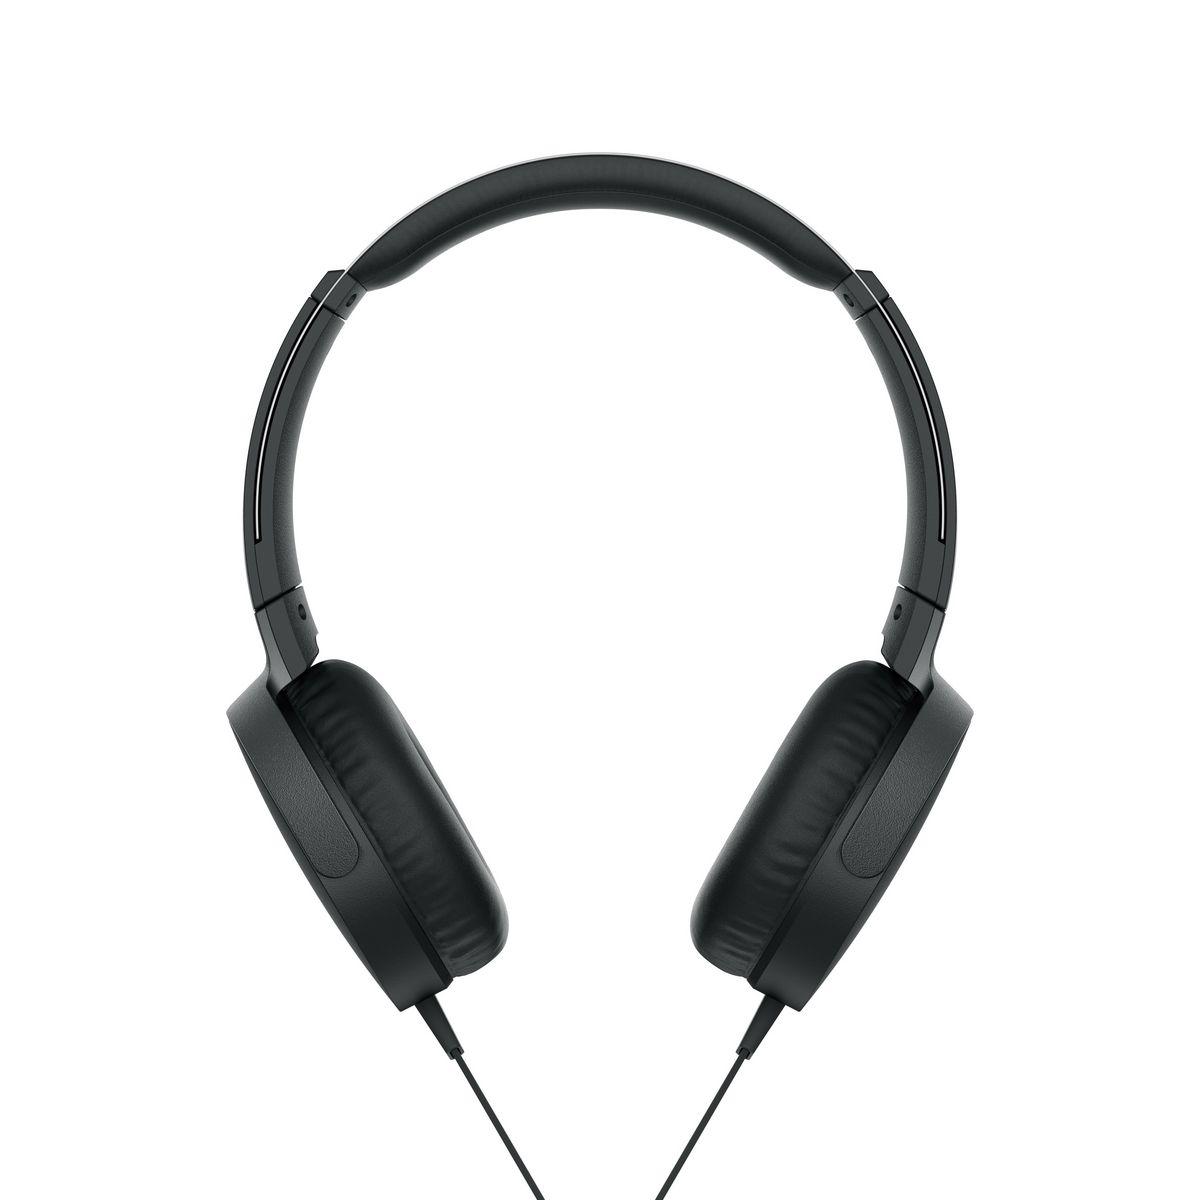 Casque audio filaire - Noir - MDR-XB550AP Extra Bass